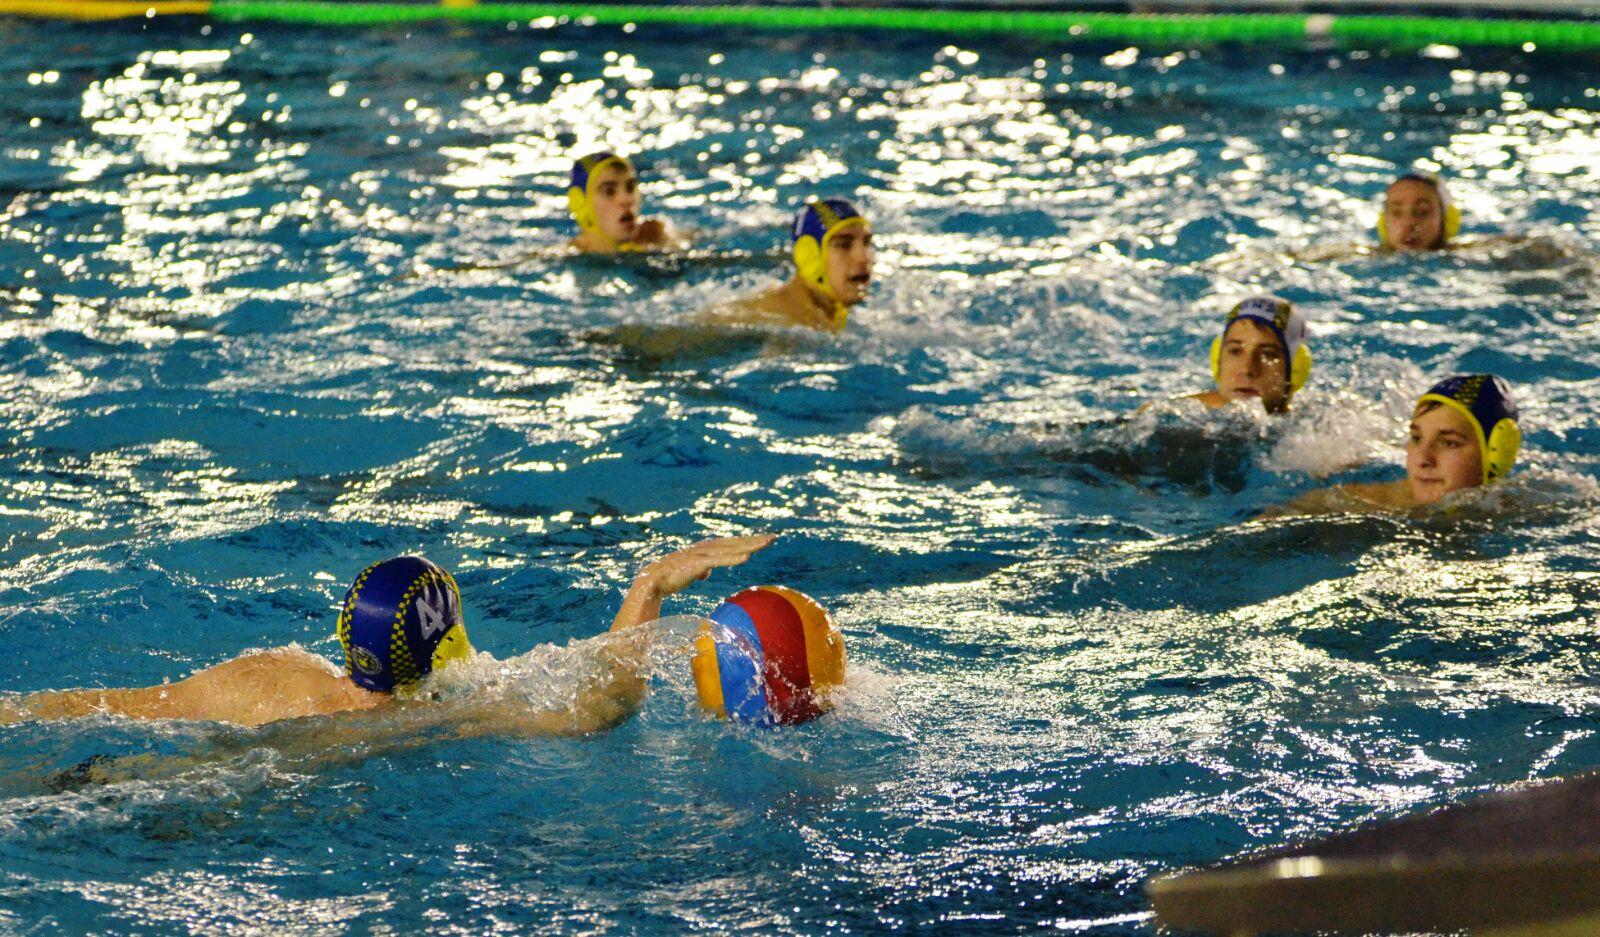 Club waterpolo castell partido de segunda divisi n nacional cn n utica portugalete vs cw castell - Piscinas de portugalete ...